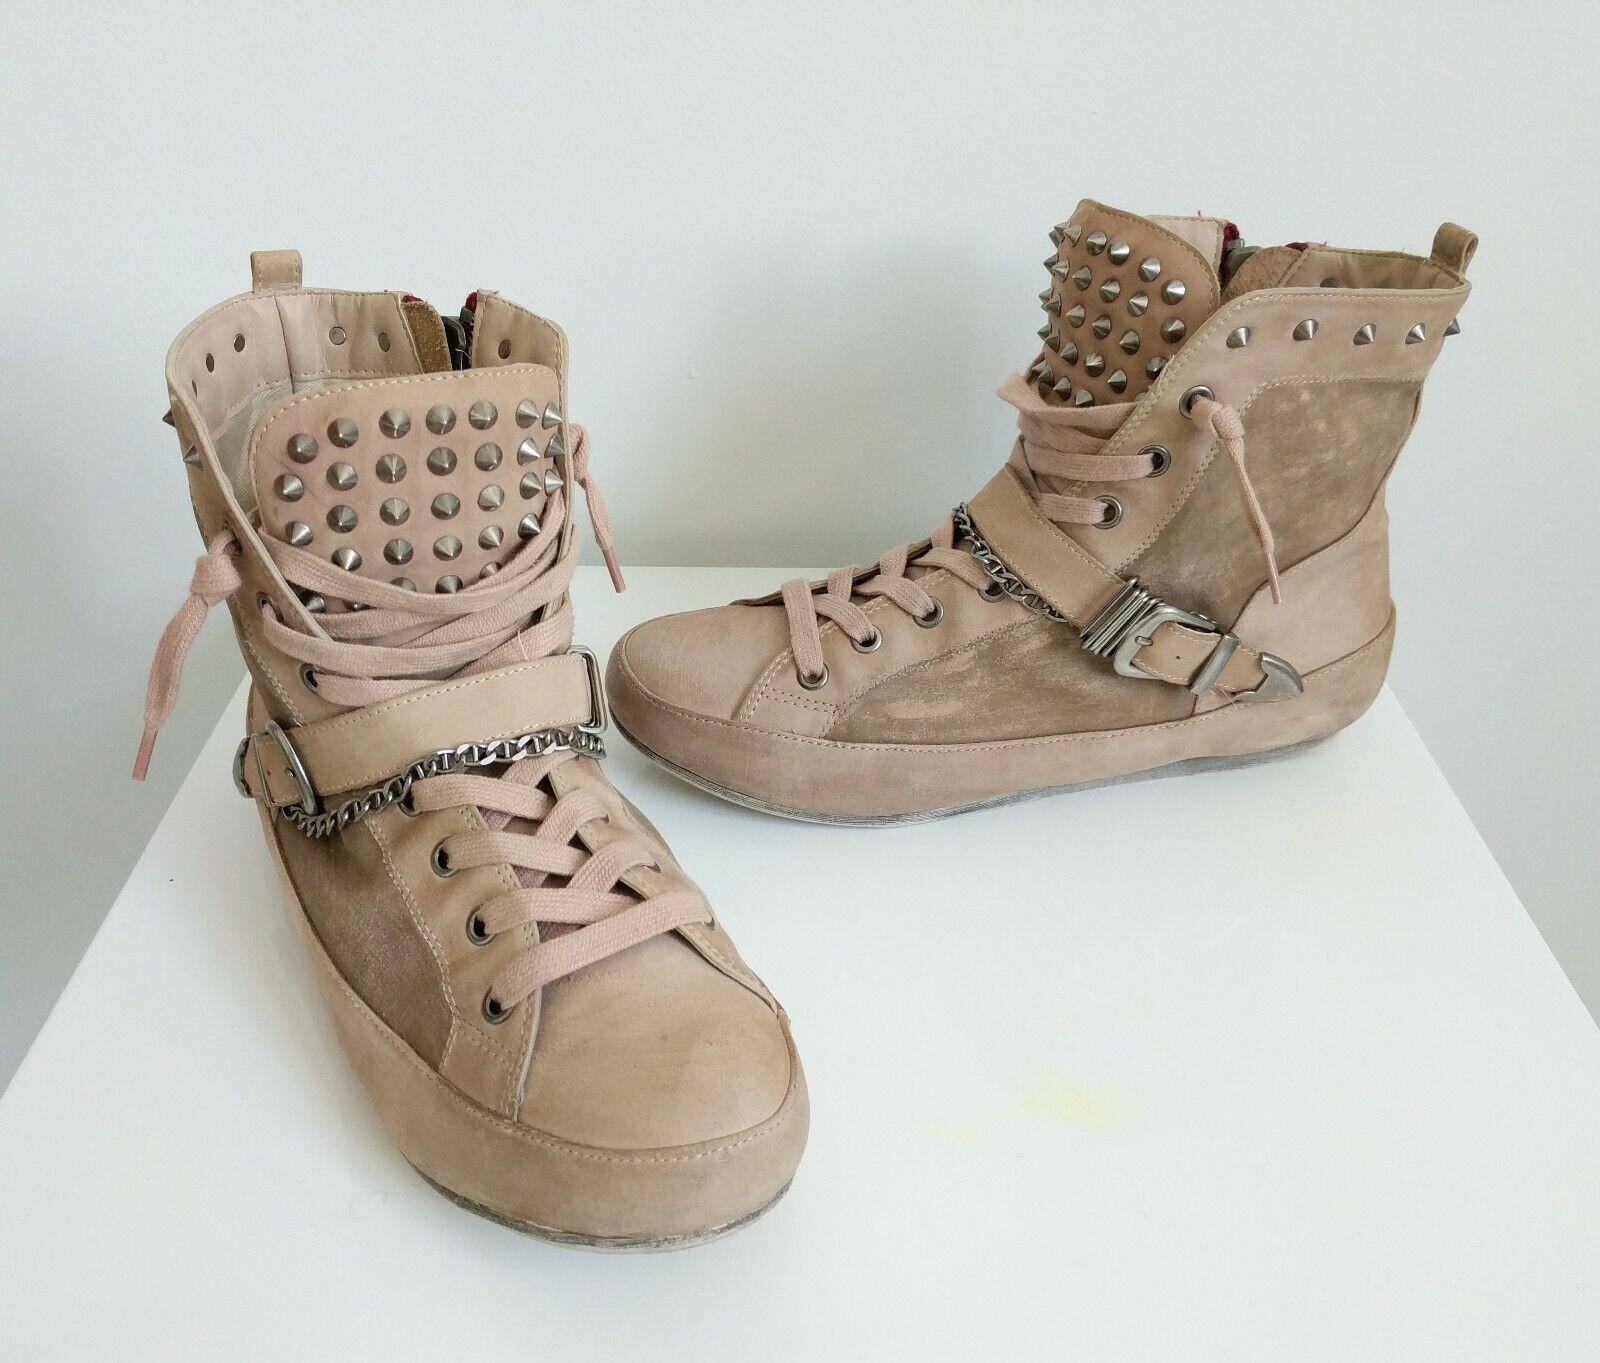 SAM EDELMAN 'ALEXANDER  Distressed Studded High-top Sneaker Retail   Size 9